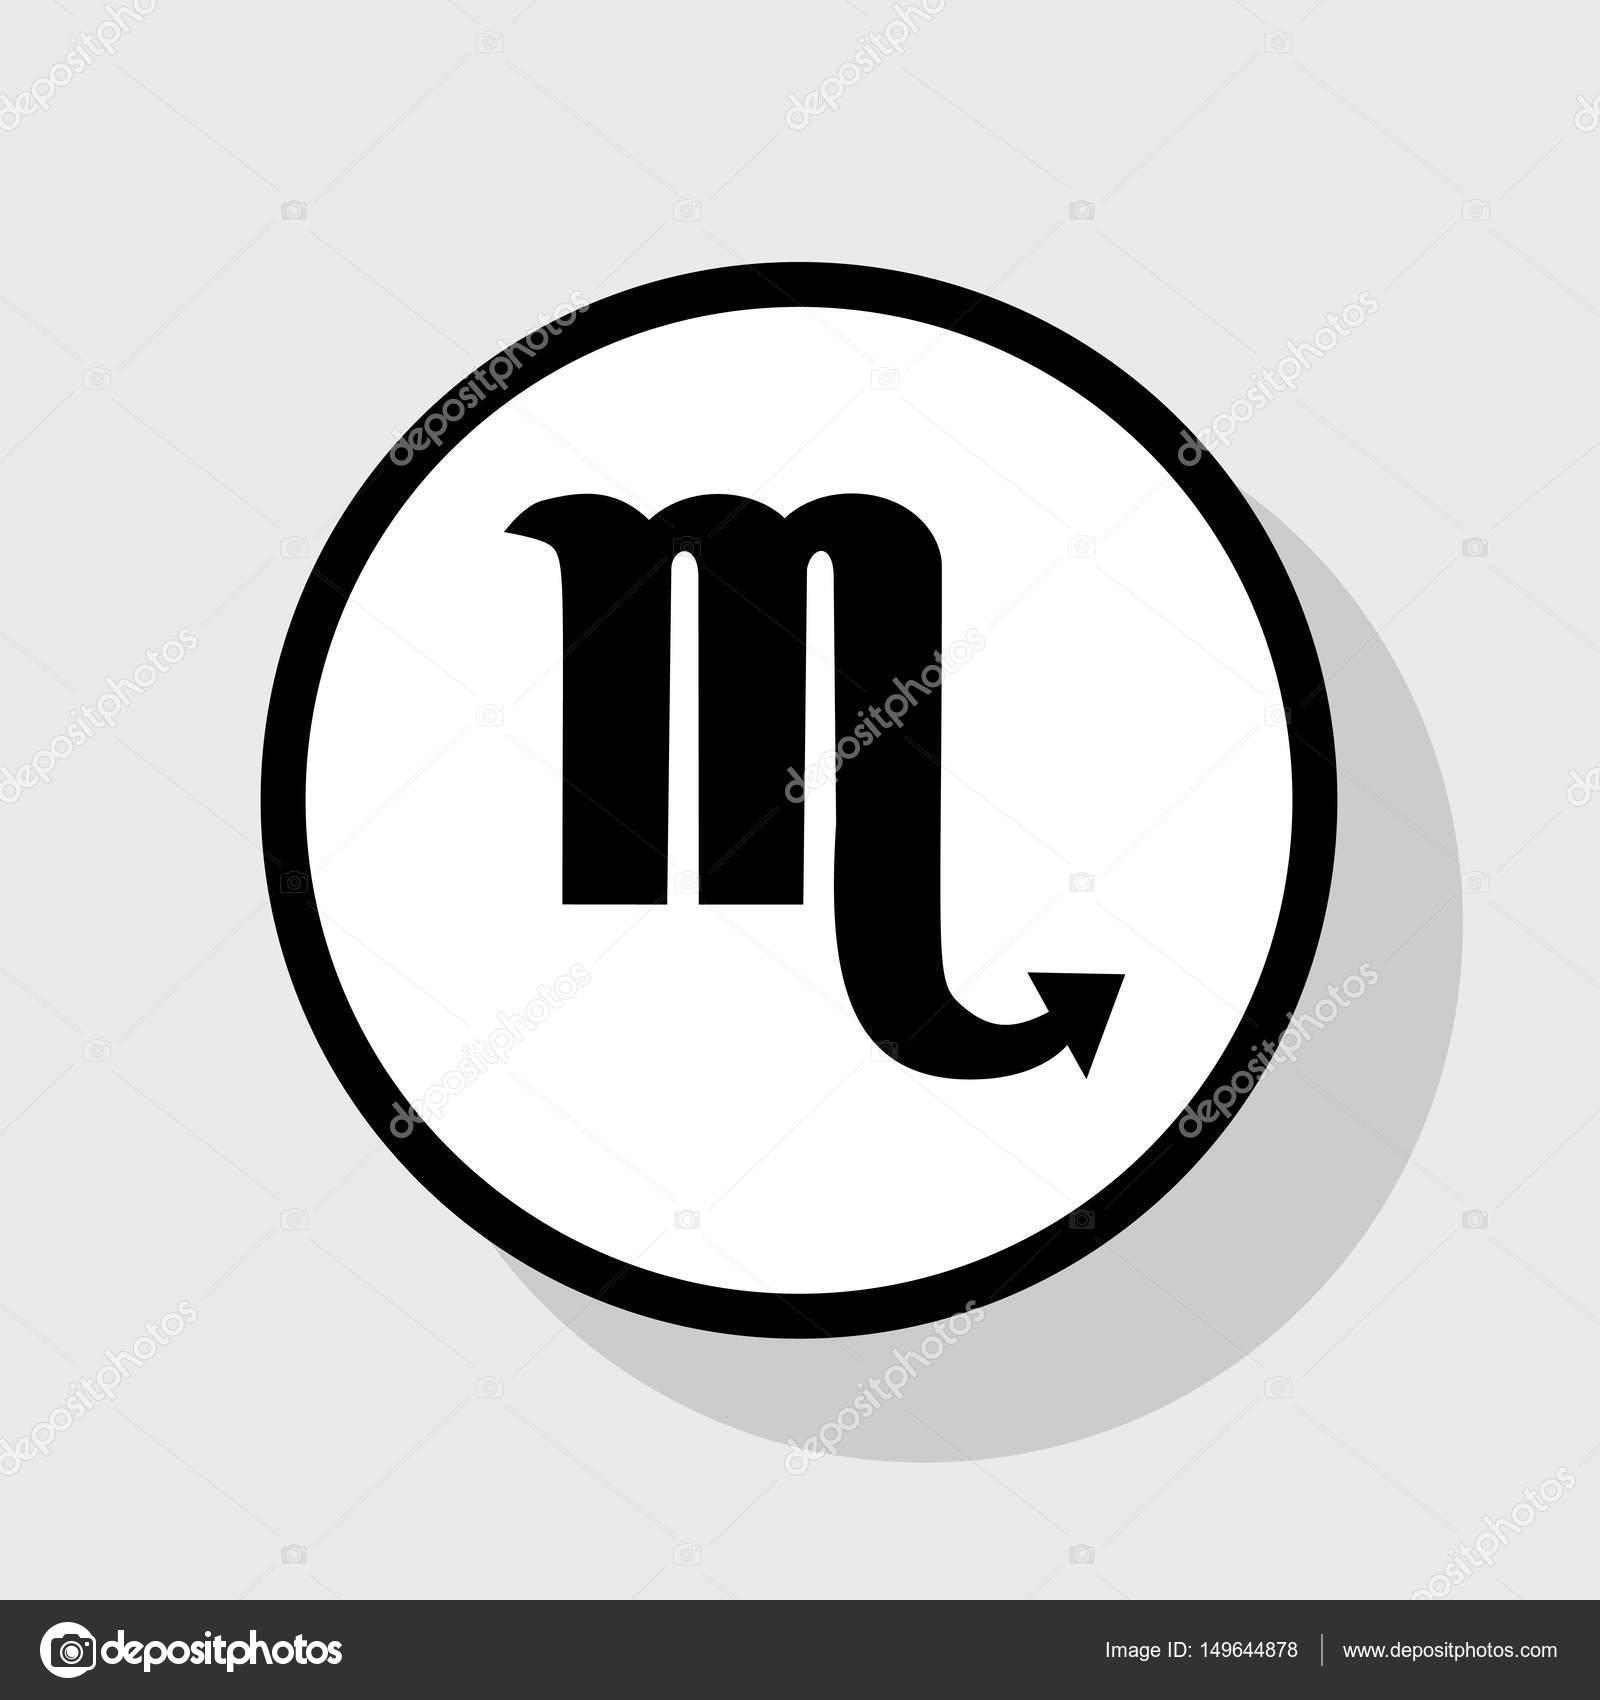 Scorpio sign illustration vector flat black icon in white circle scorpio sign illustration vector flat black icon in white circle with shadow at gray buycottarizona Image collections